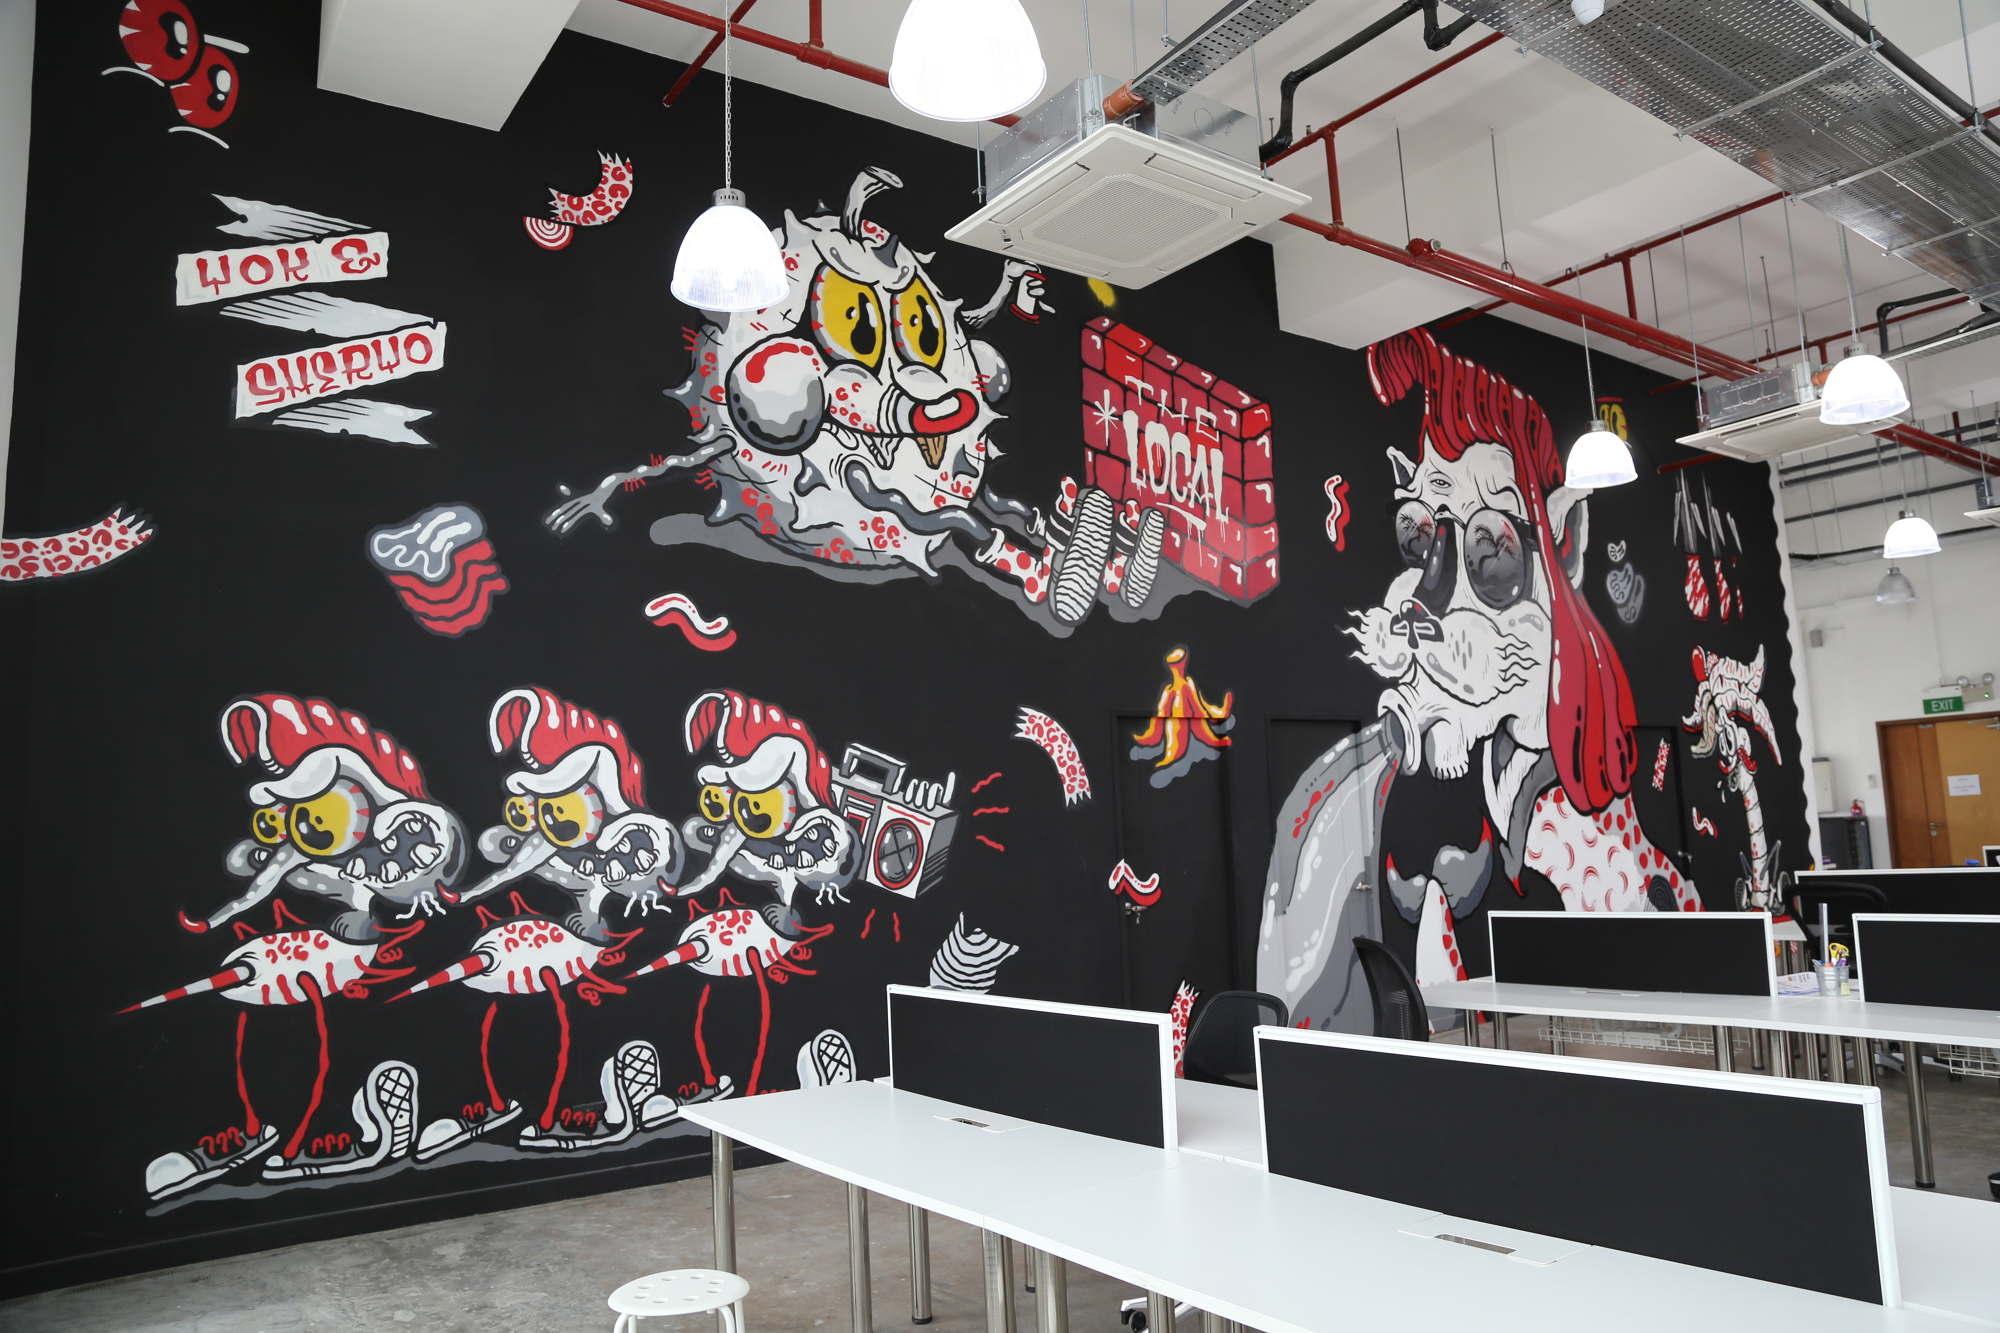 yok-sheryo-graffiti-cartoon-skateboard-11